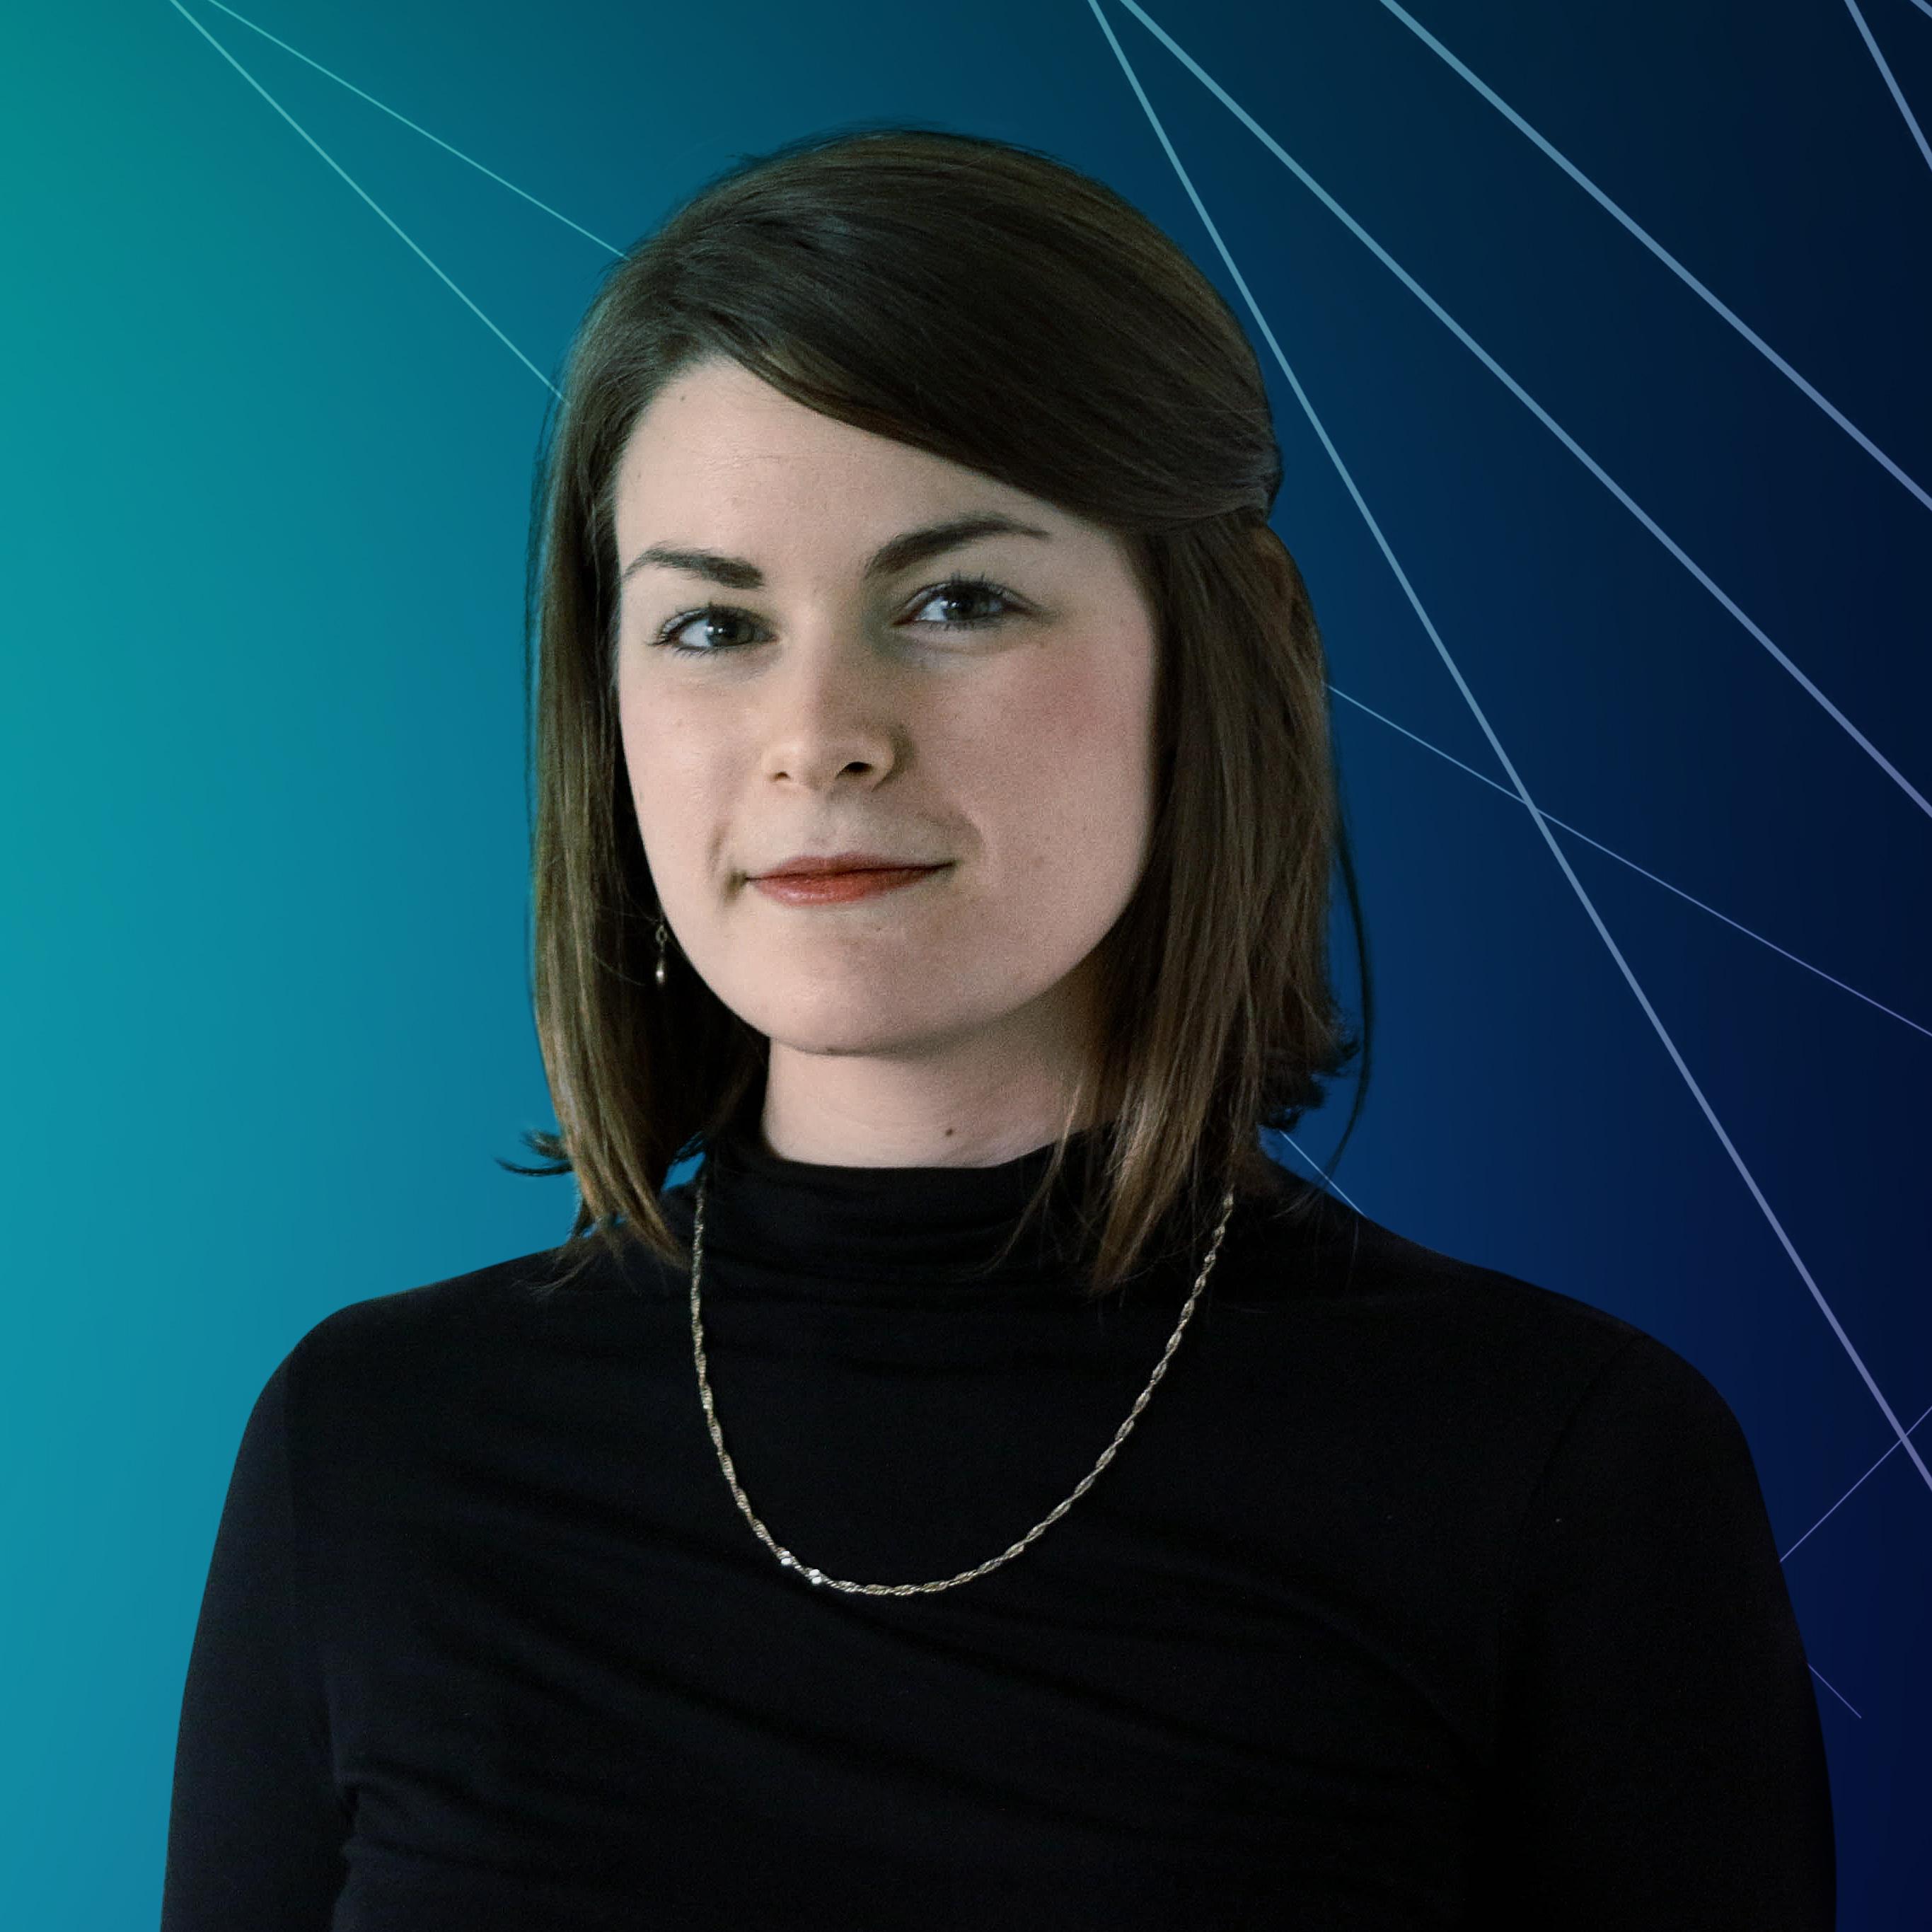 Janet Rafner Future Port Prague 10.—11. 9. 2019